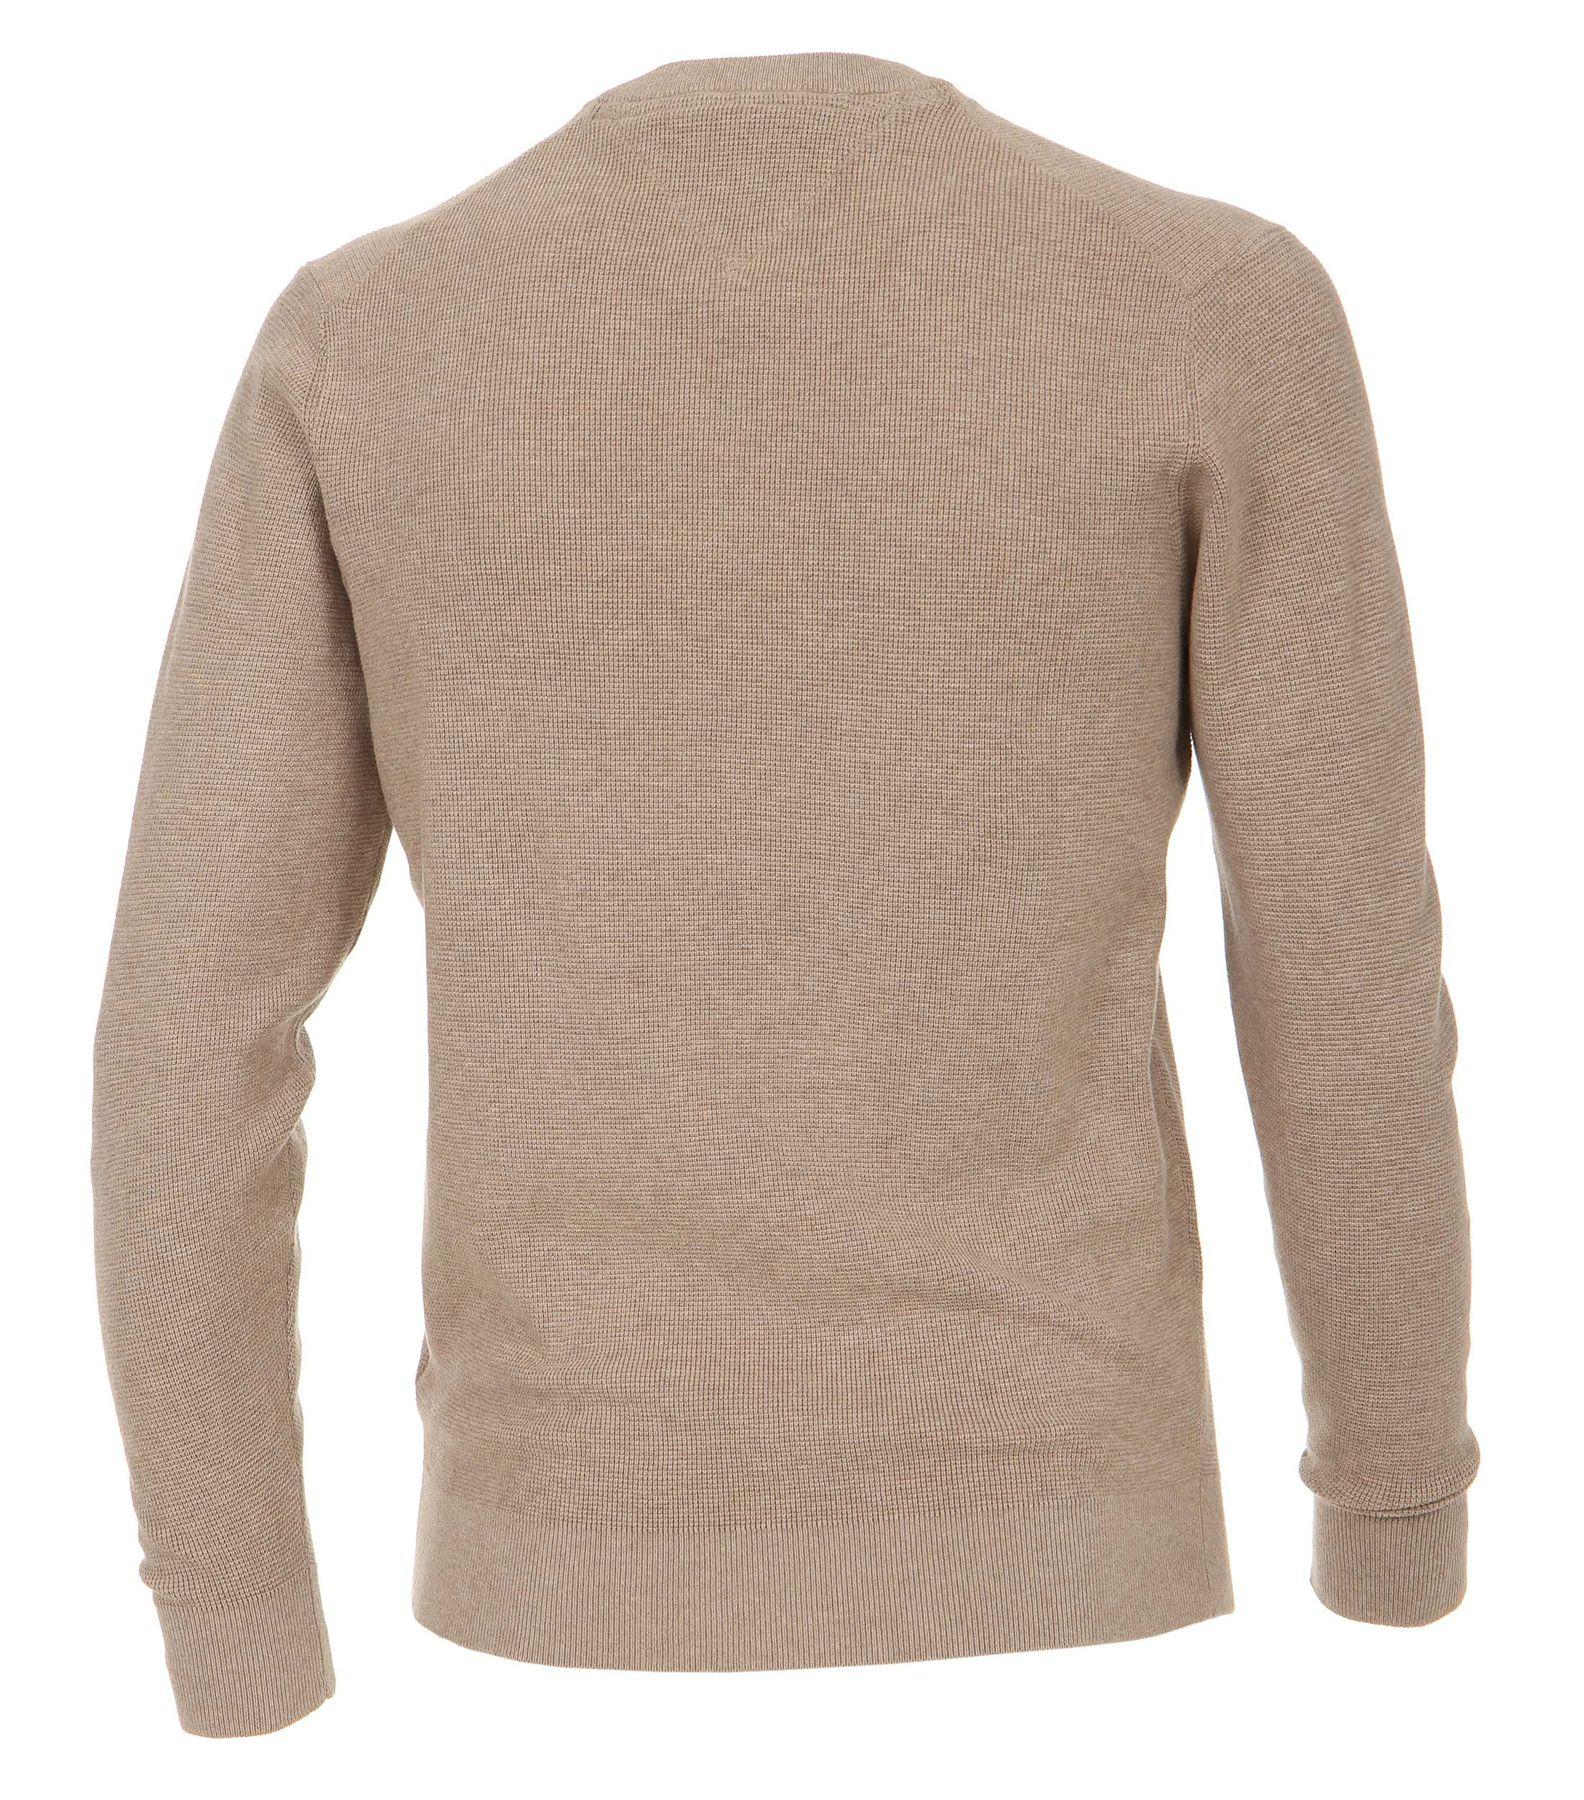 Casa Moda - Unifarbener Herren Pullover mit V-Ausschnitt  (472625000) – Bild 11